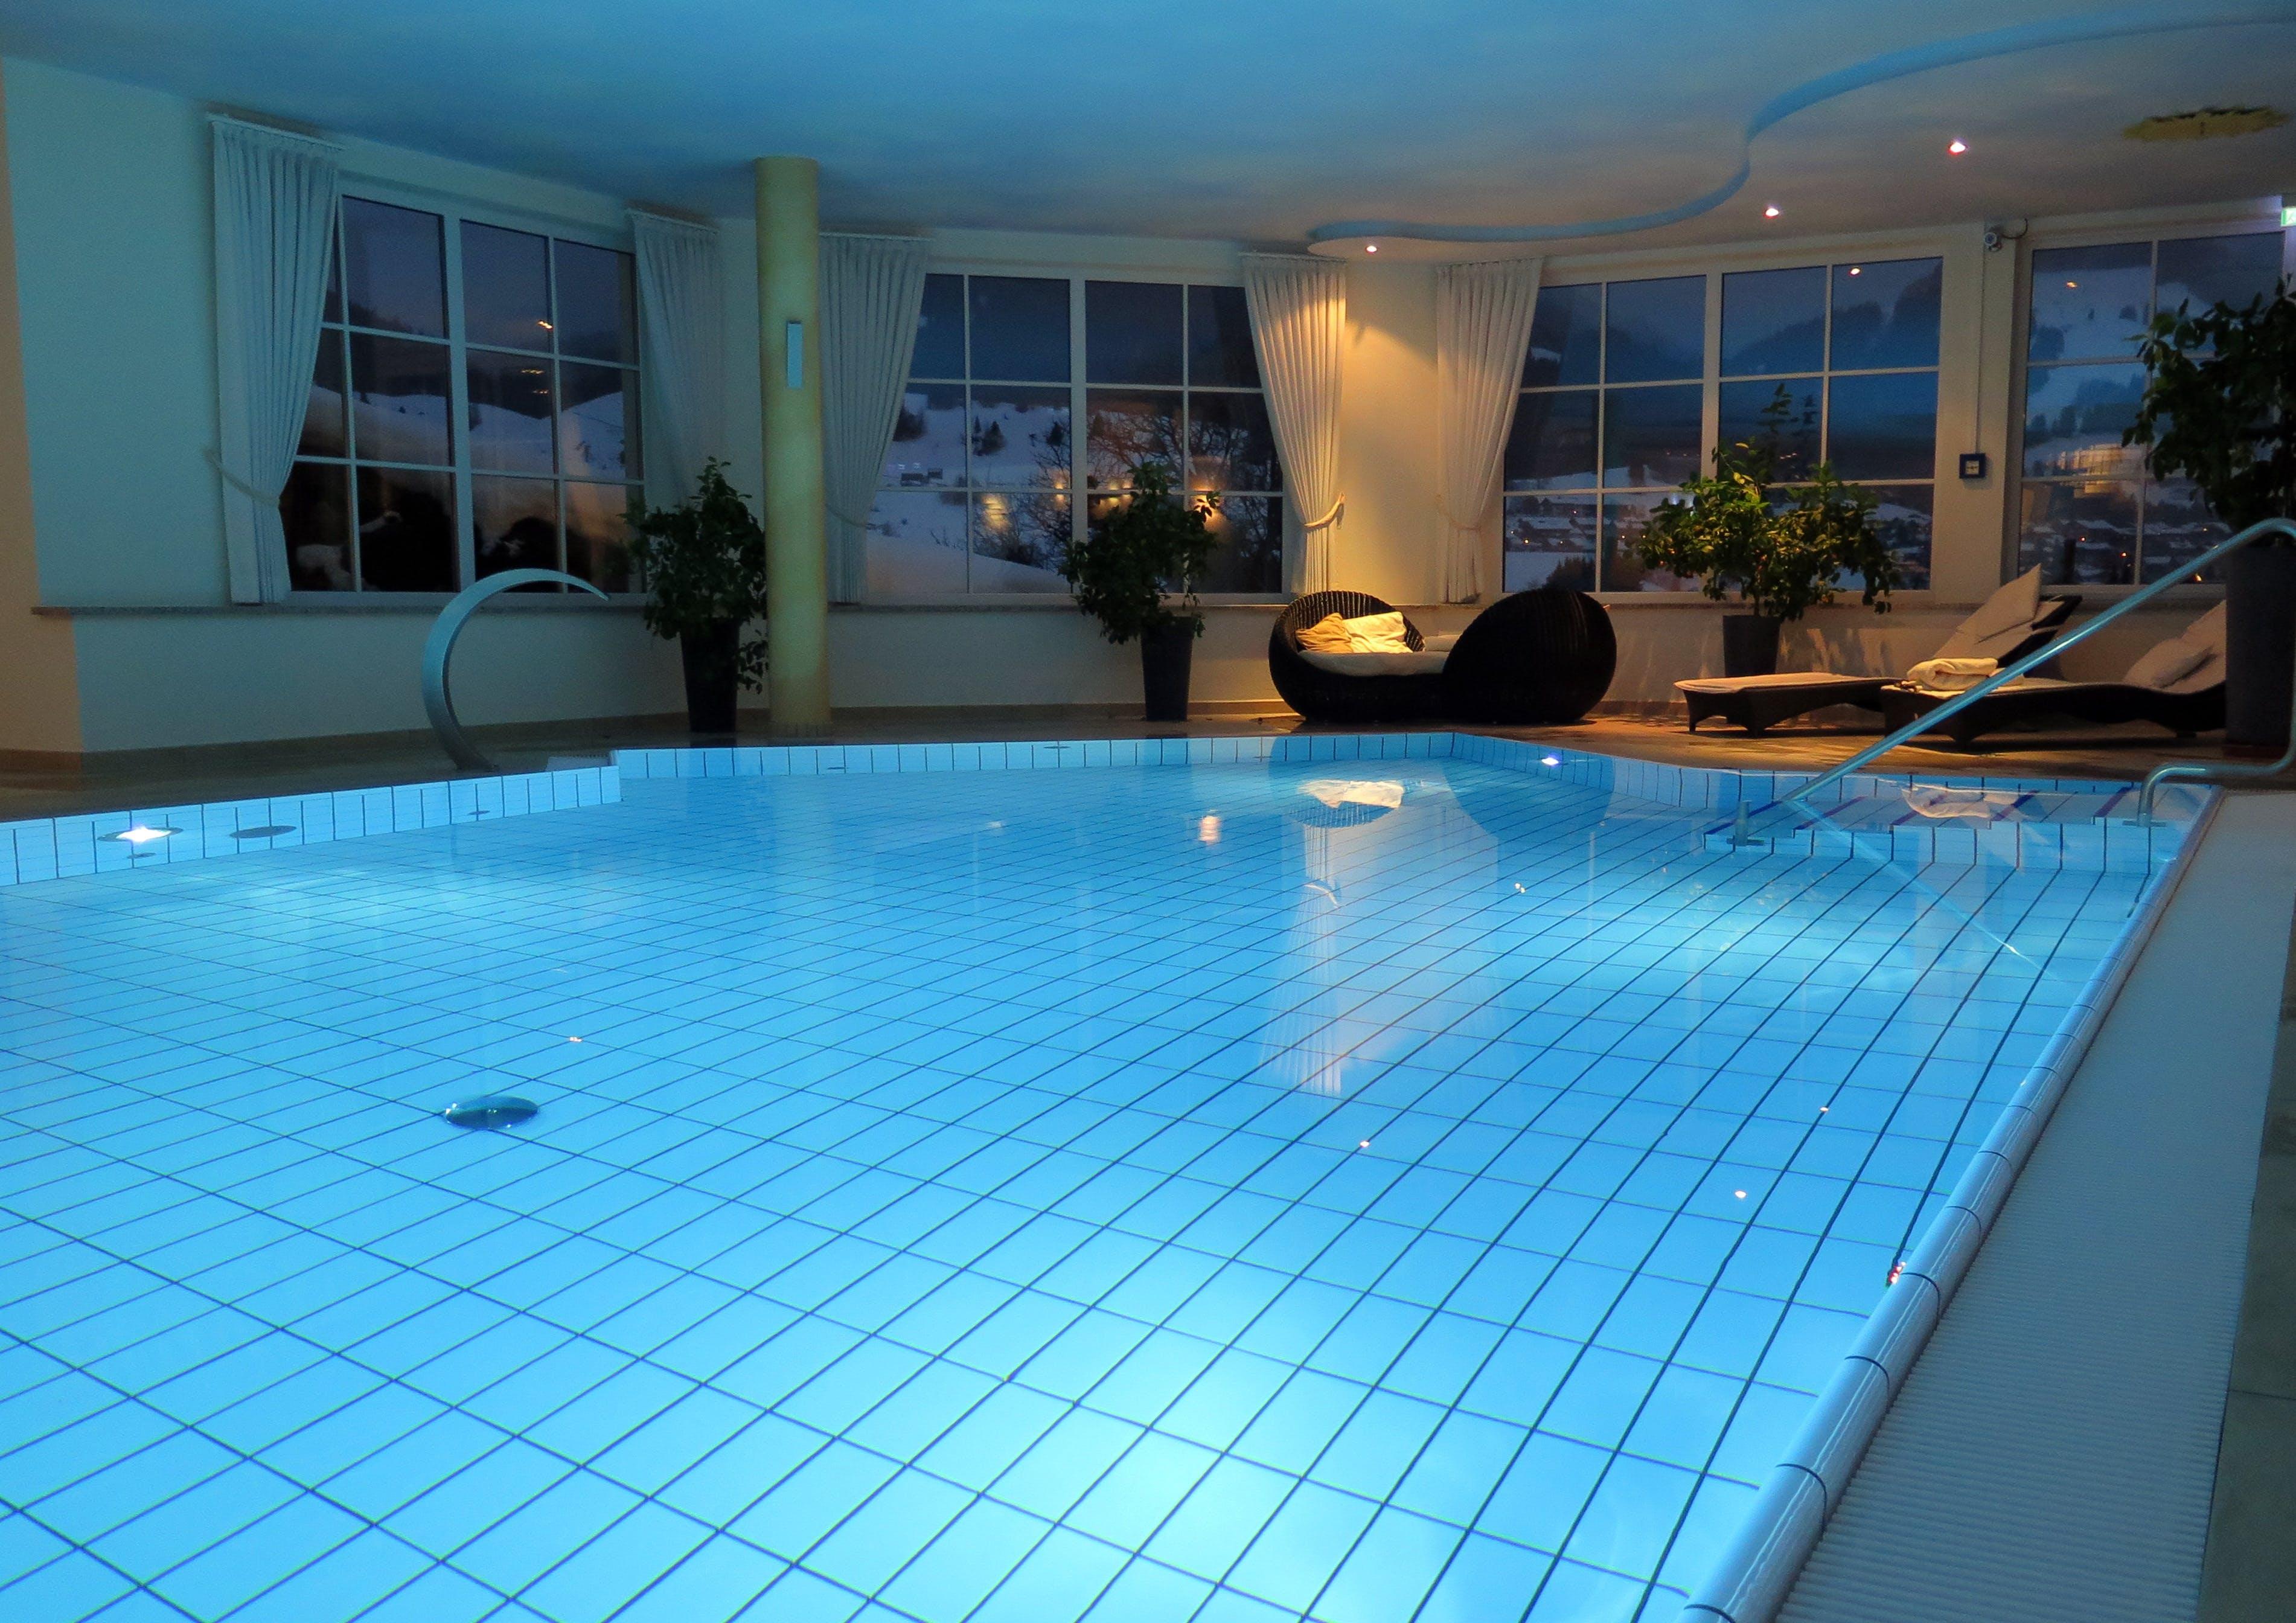 architecture, indoor swimming pool, indoors